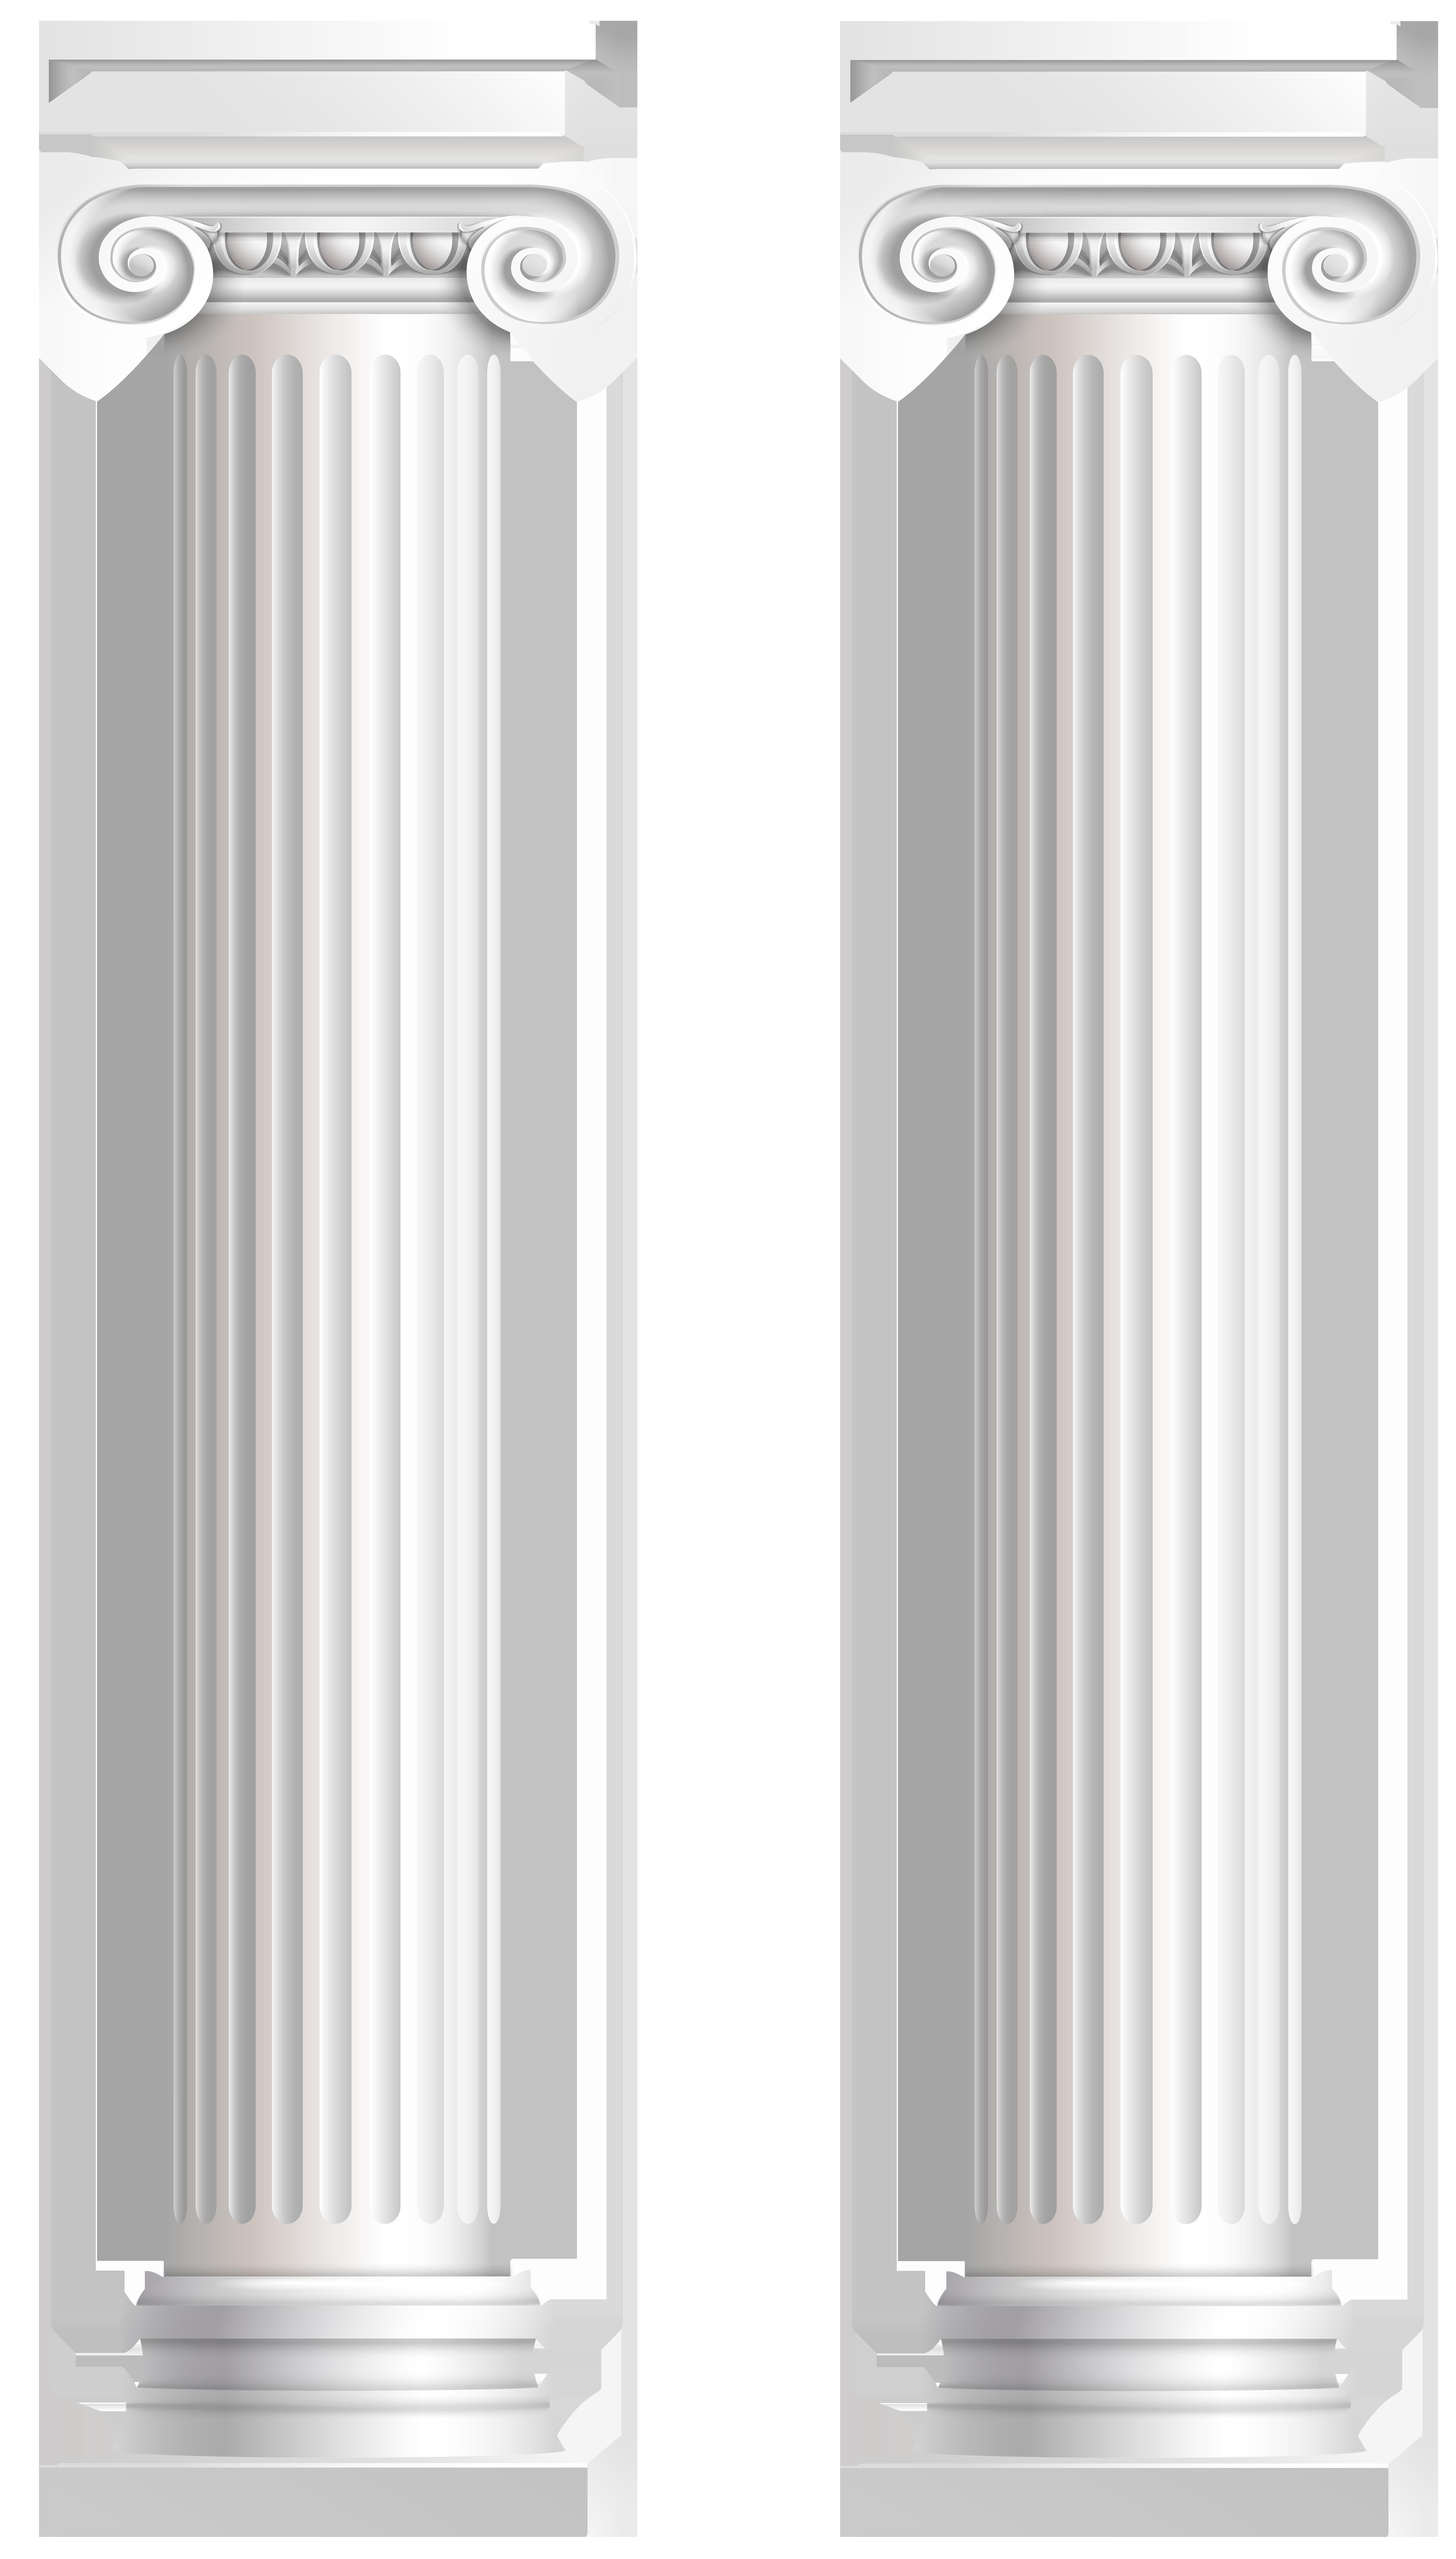 Column clipart stone pillar, Column stone pillar Transparent.